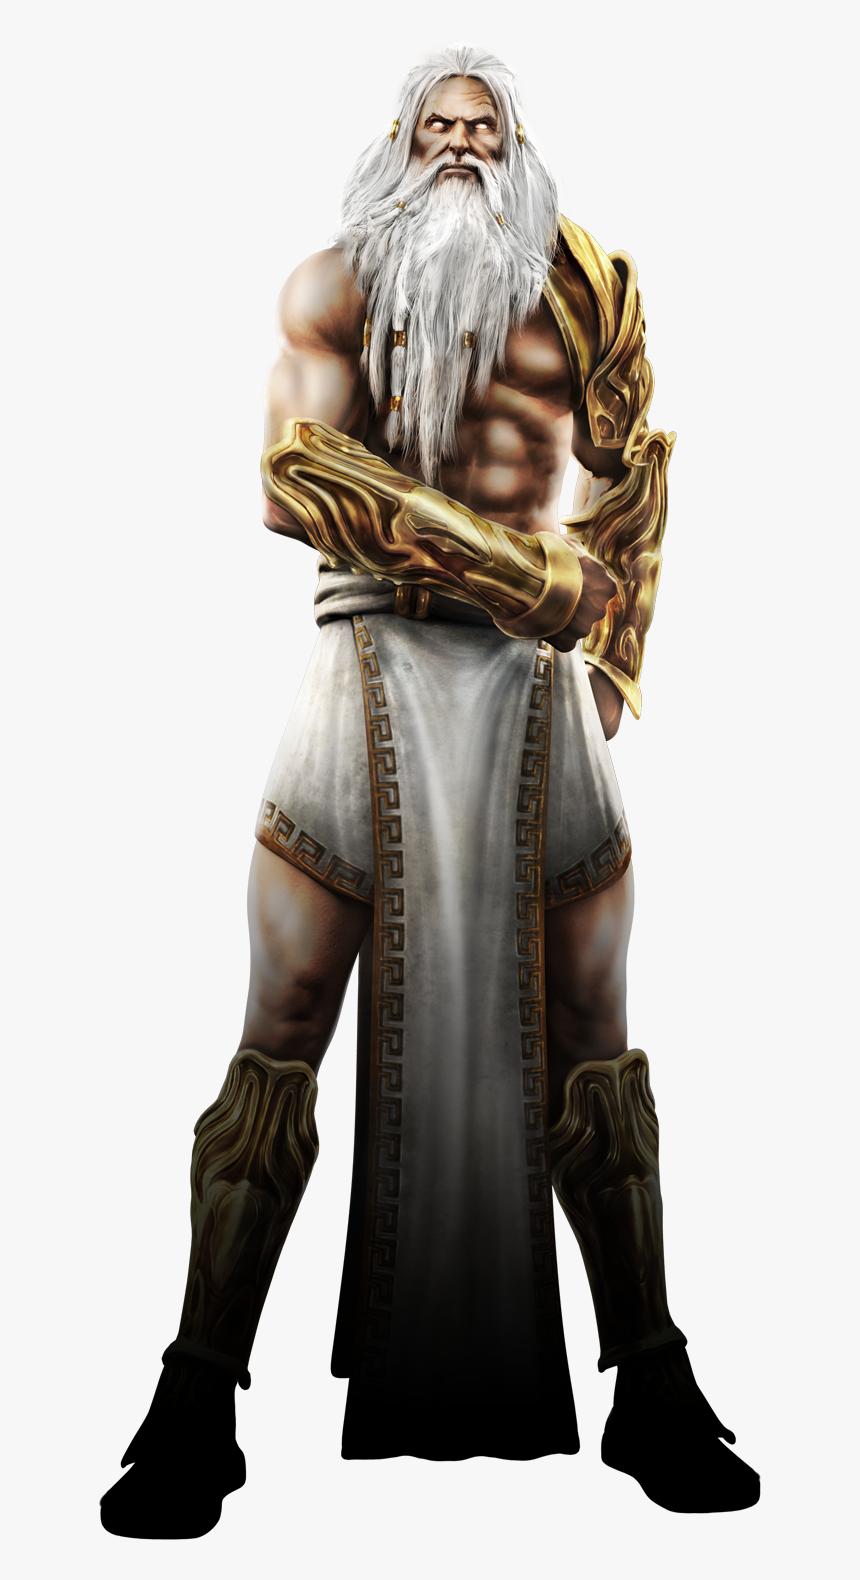 Transparent Avan Jogia Png - Zeus God Of War Png, Png Download, Free Download